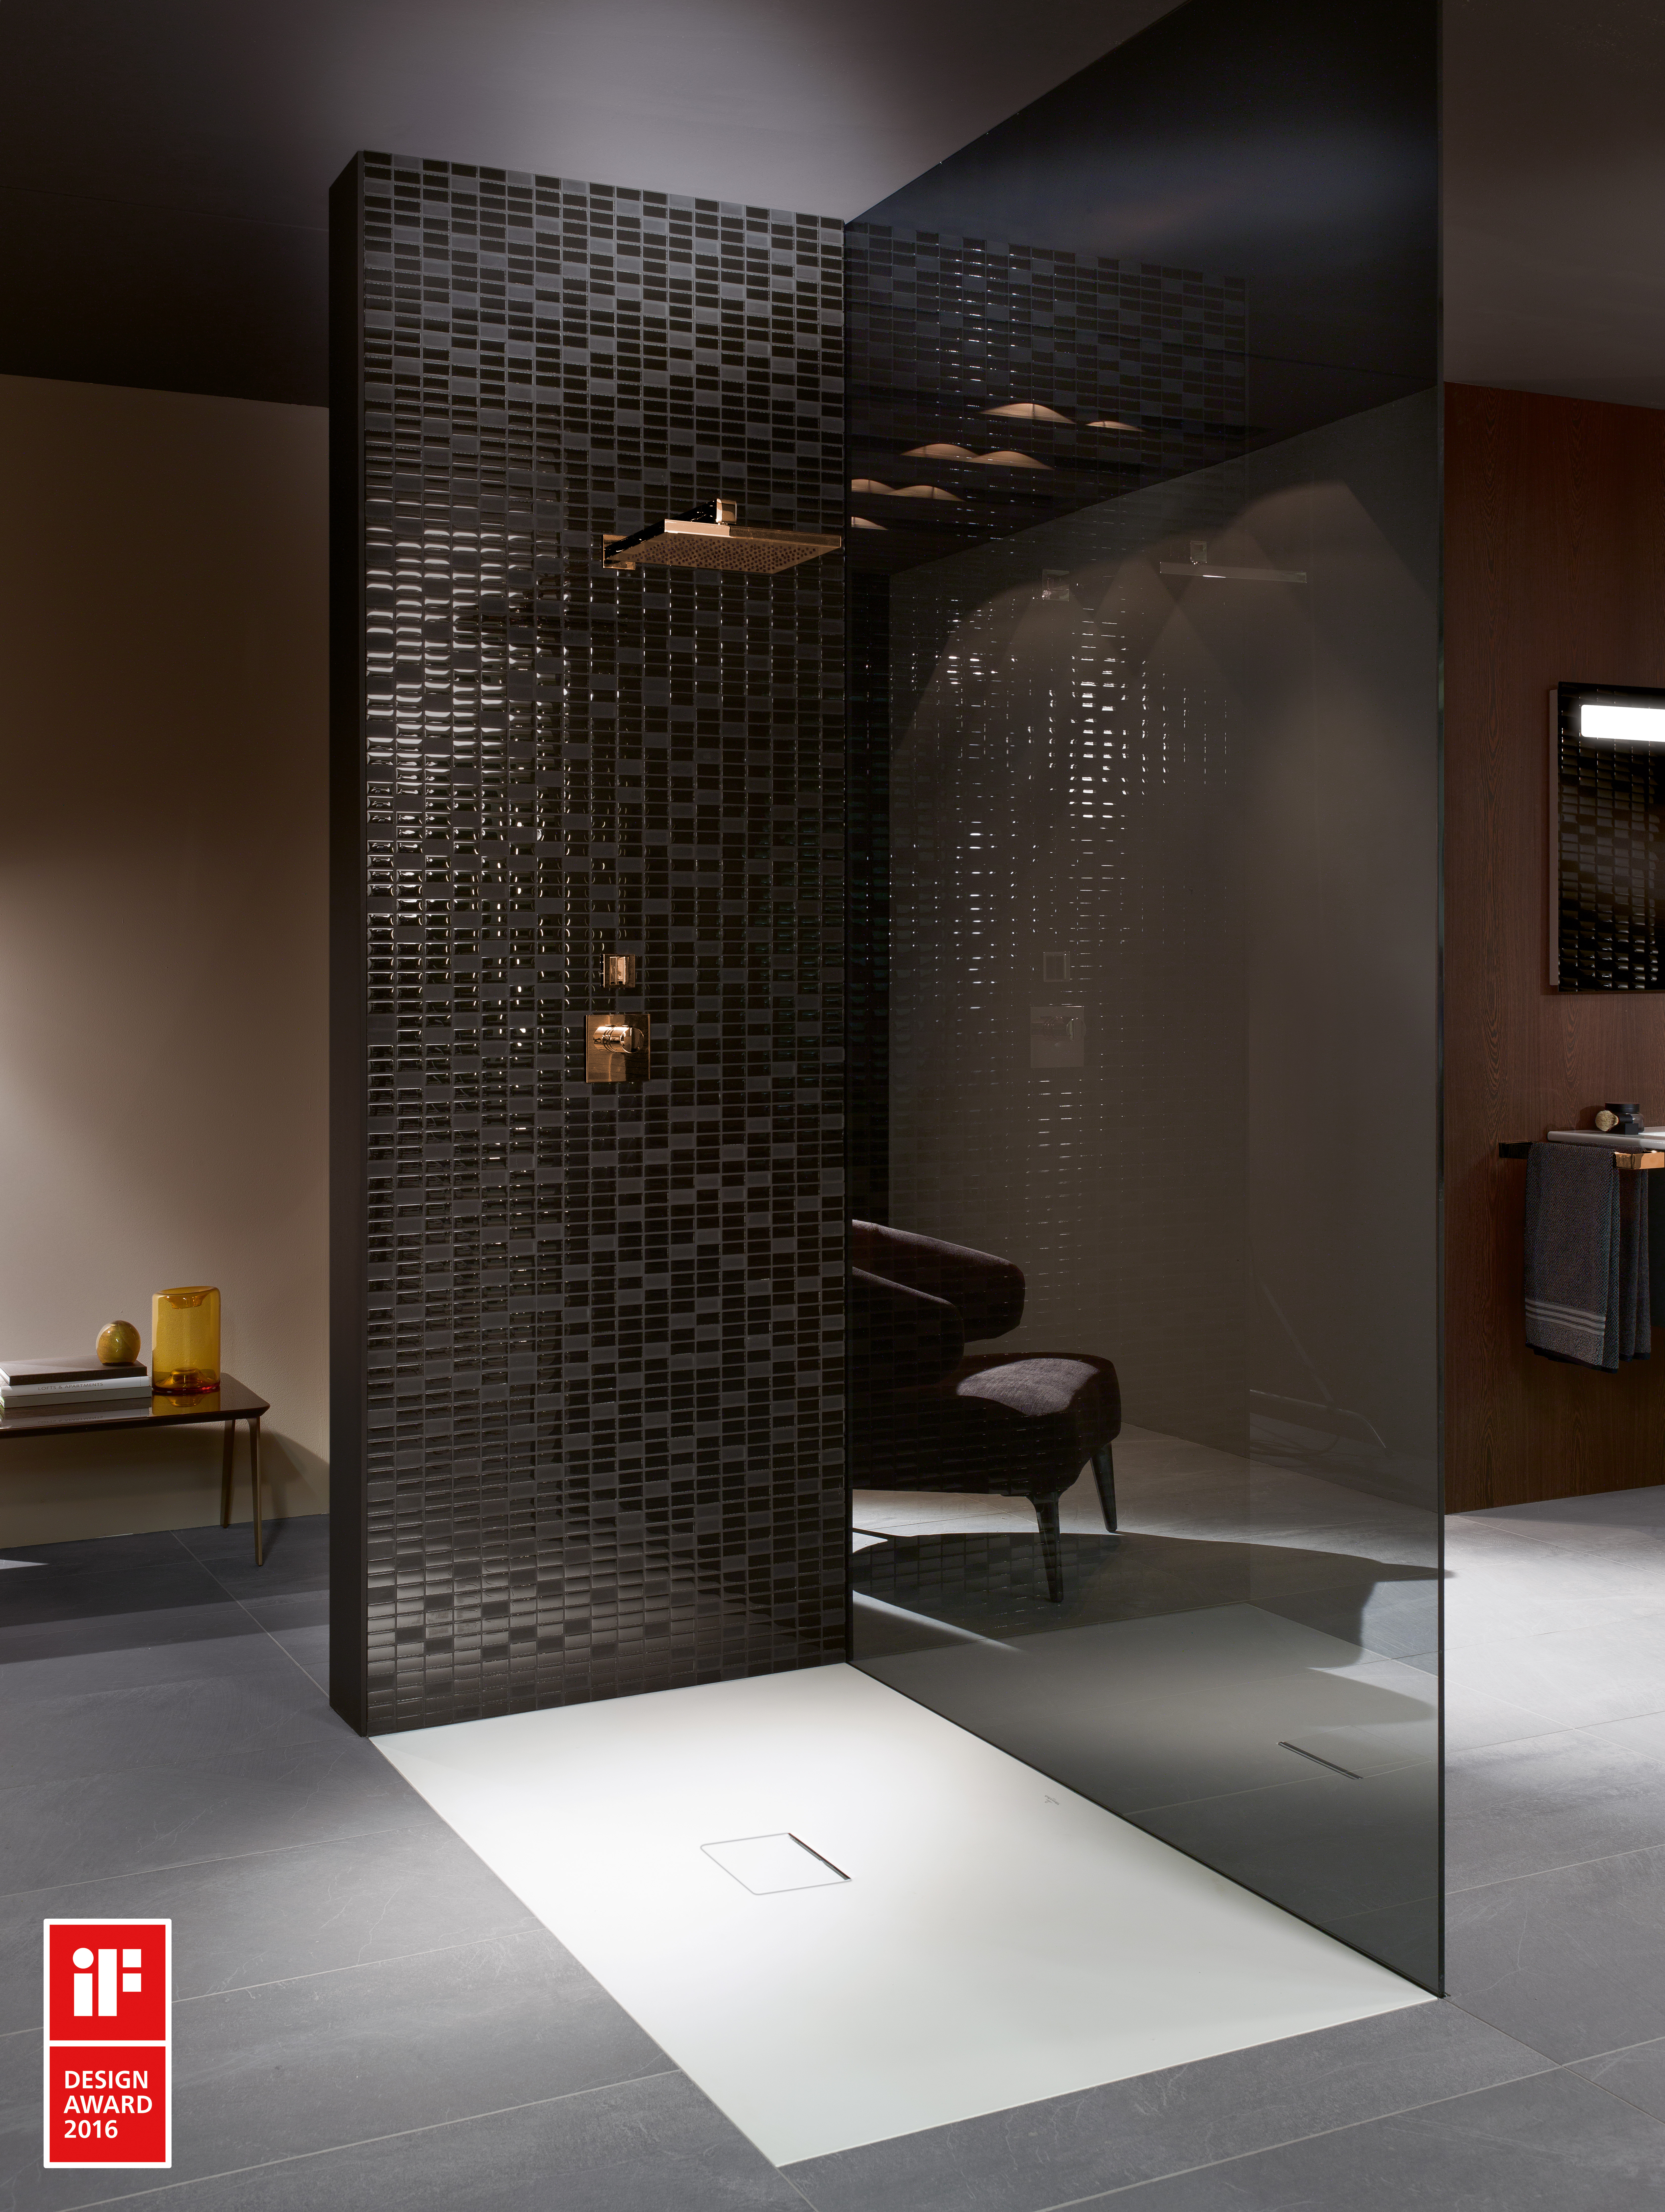 Squaro Infinity Shower tray, Shower trays (Acrylic, Quaryl), Shower trays